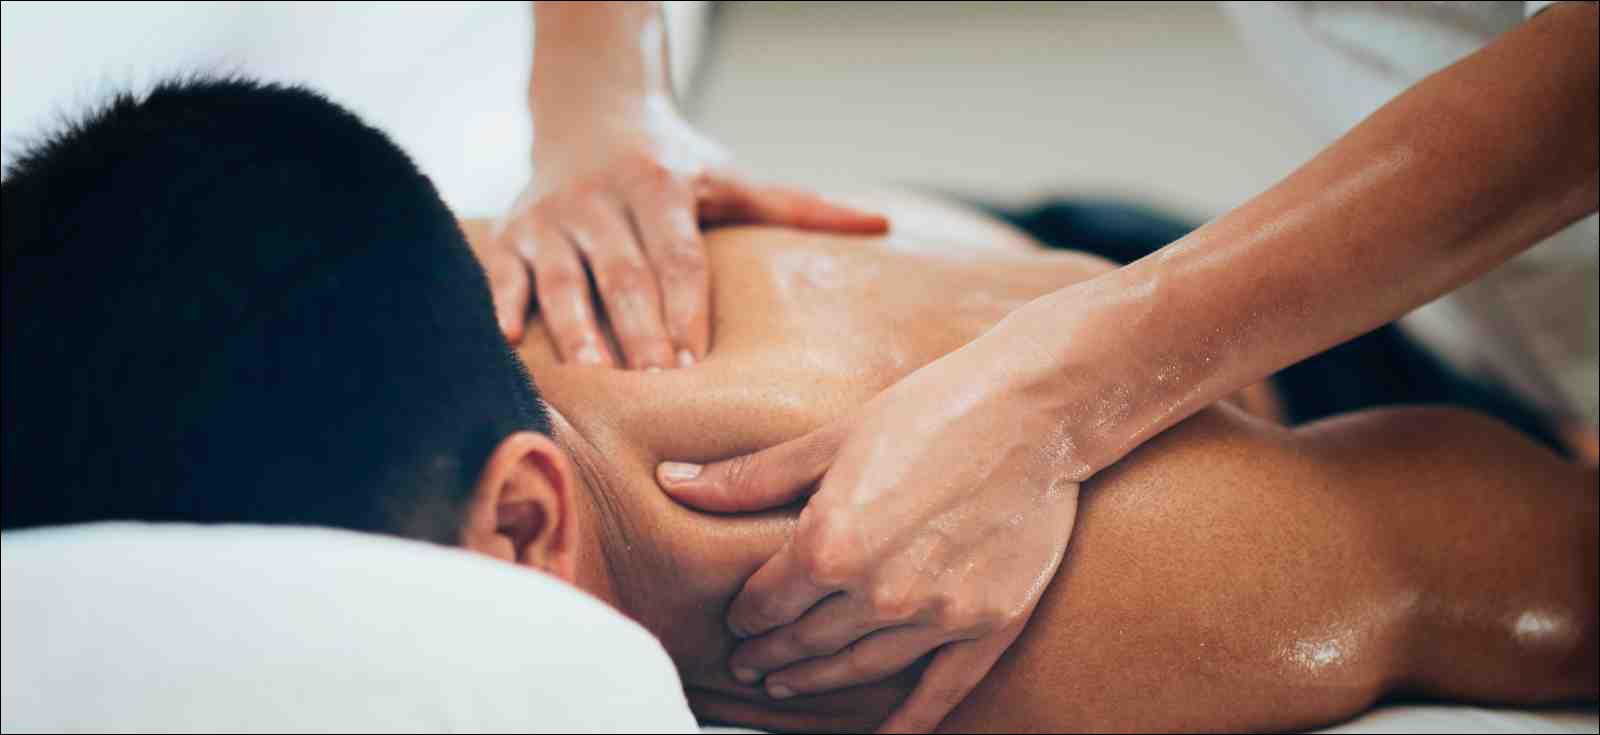 Massage therapist massaging shoulders of a male athlete